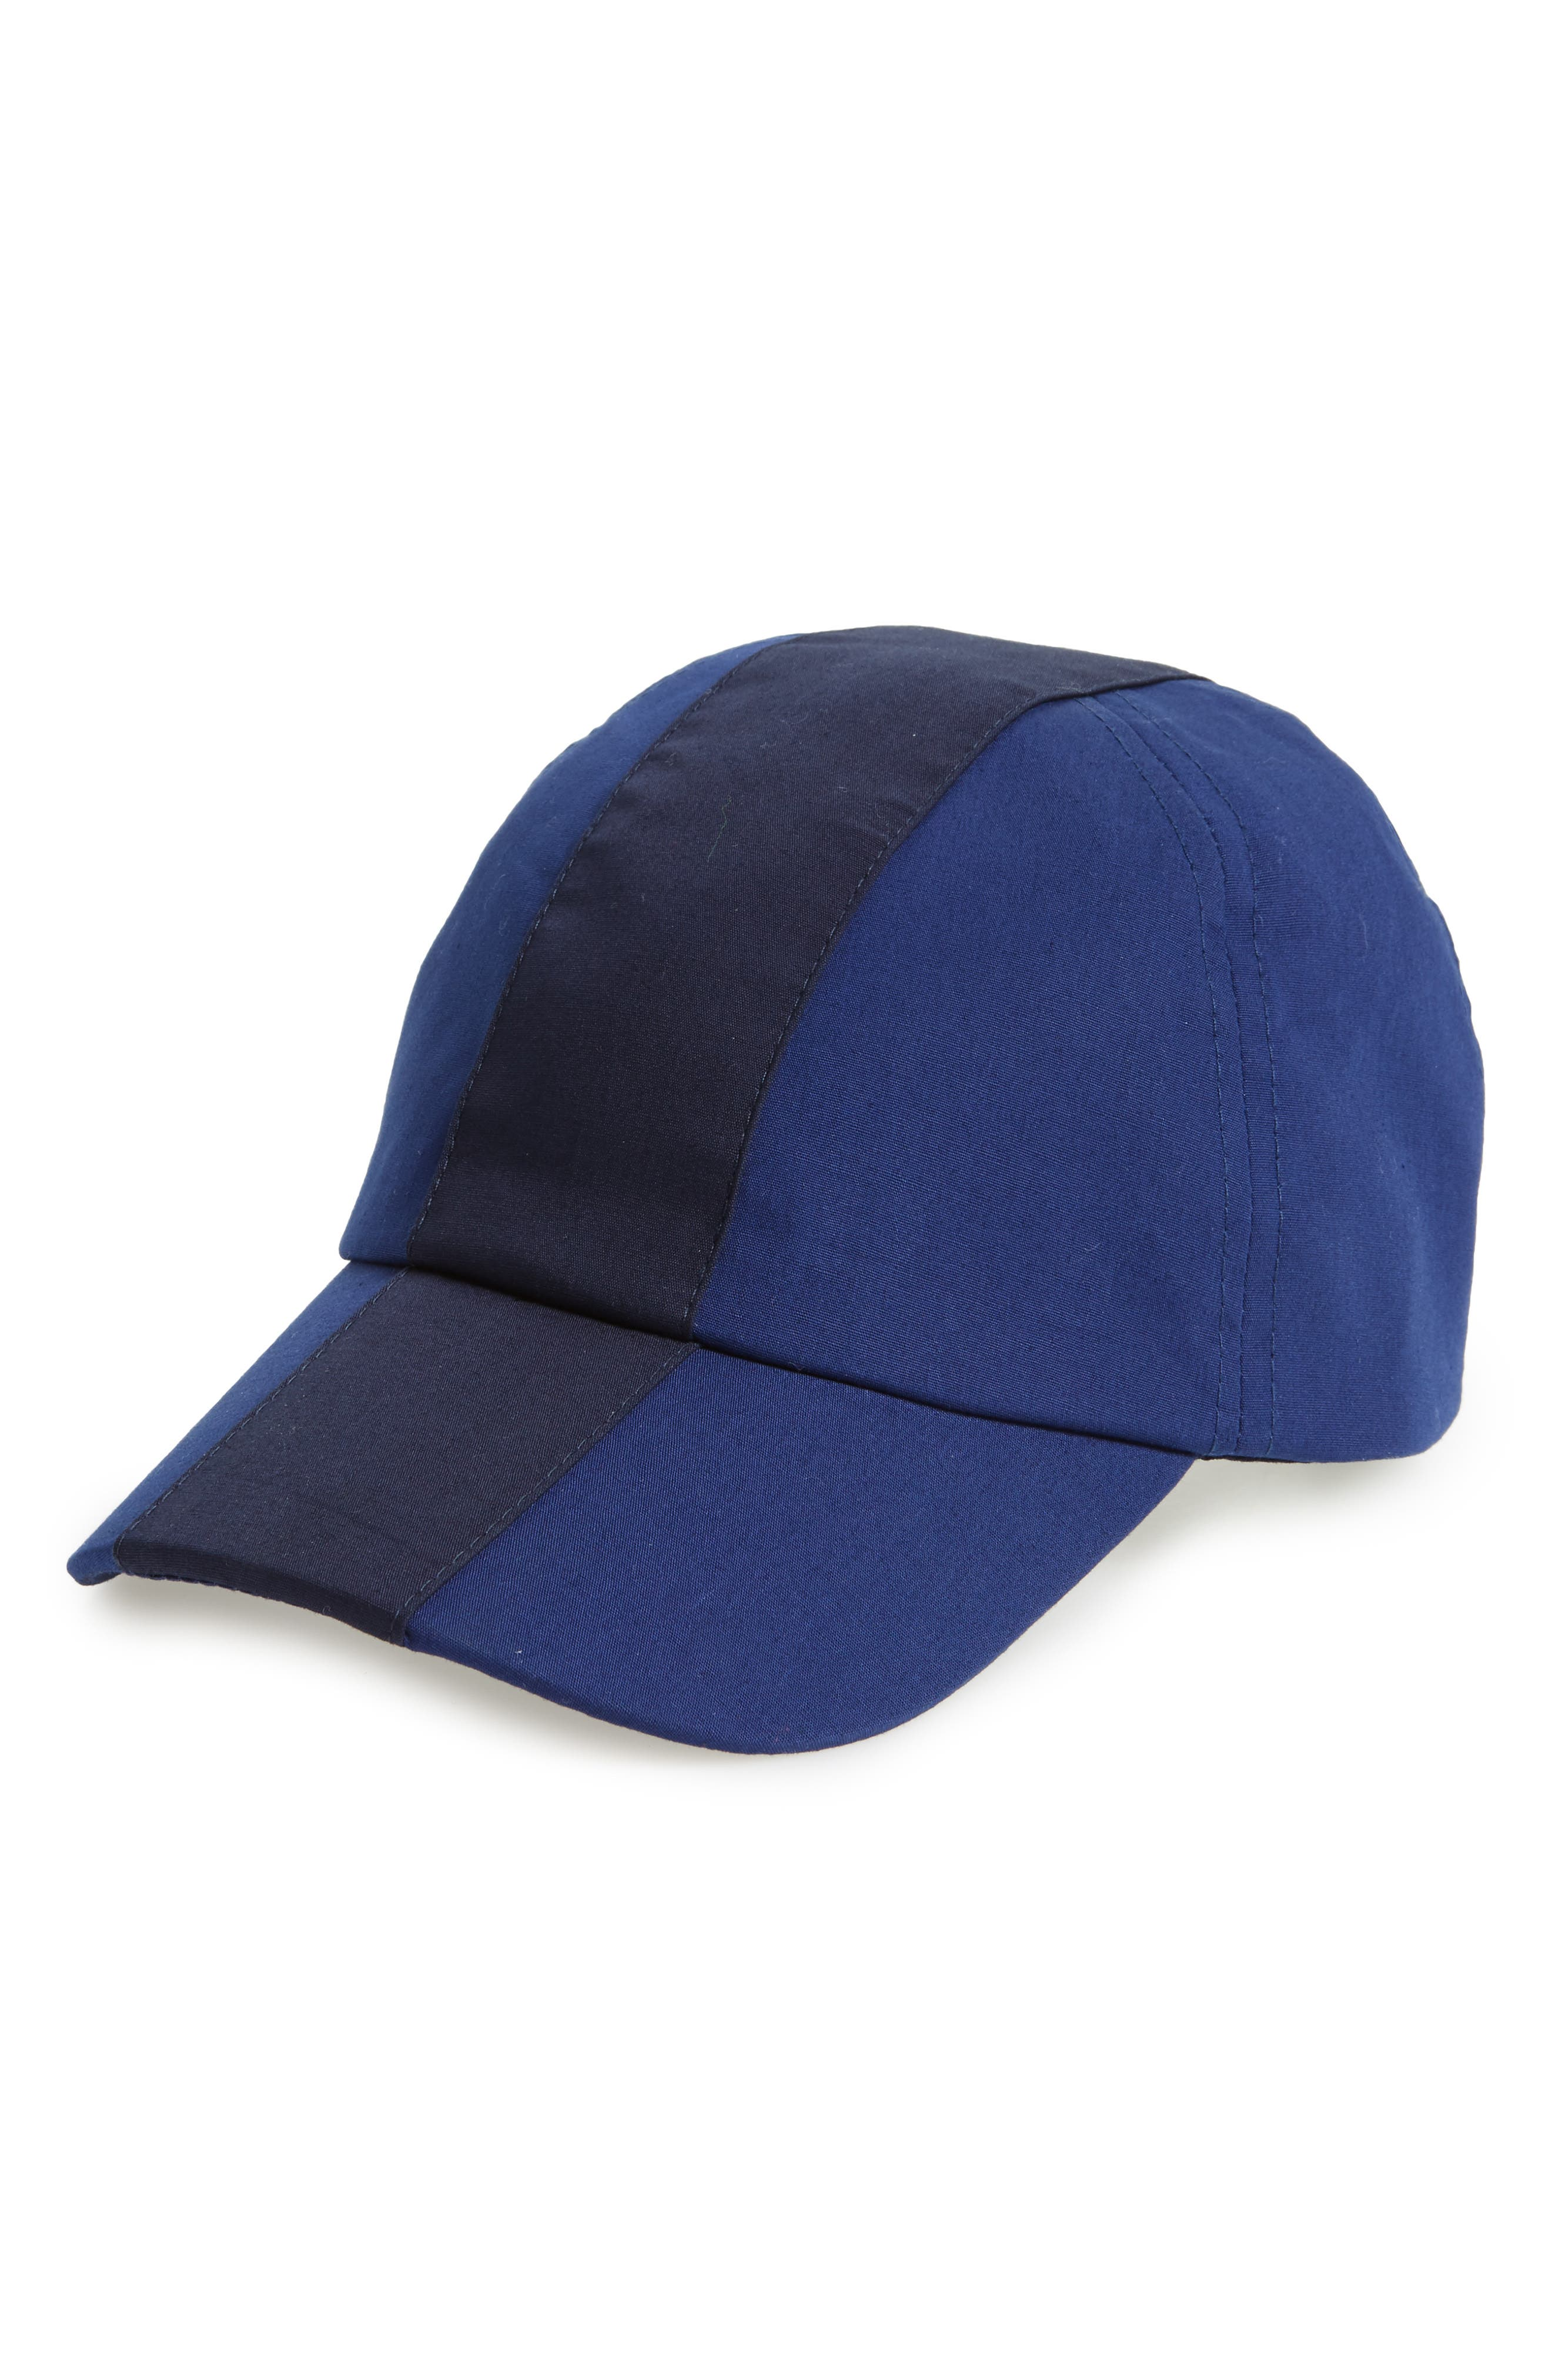 Colorblock Baseball Cap,                         Main,                         color, 407